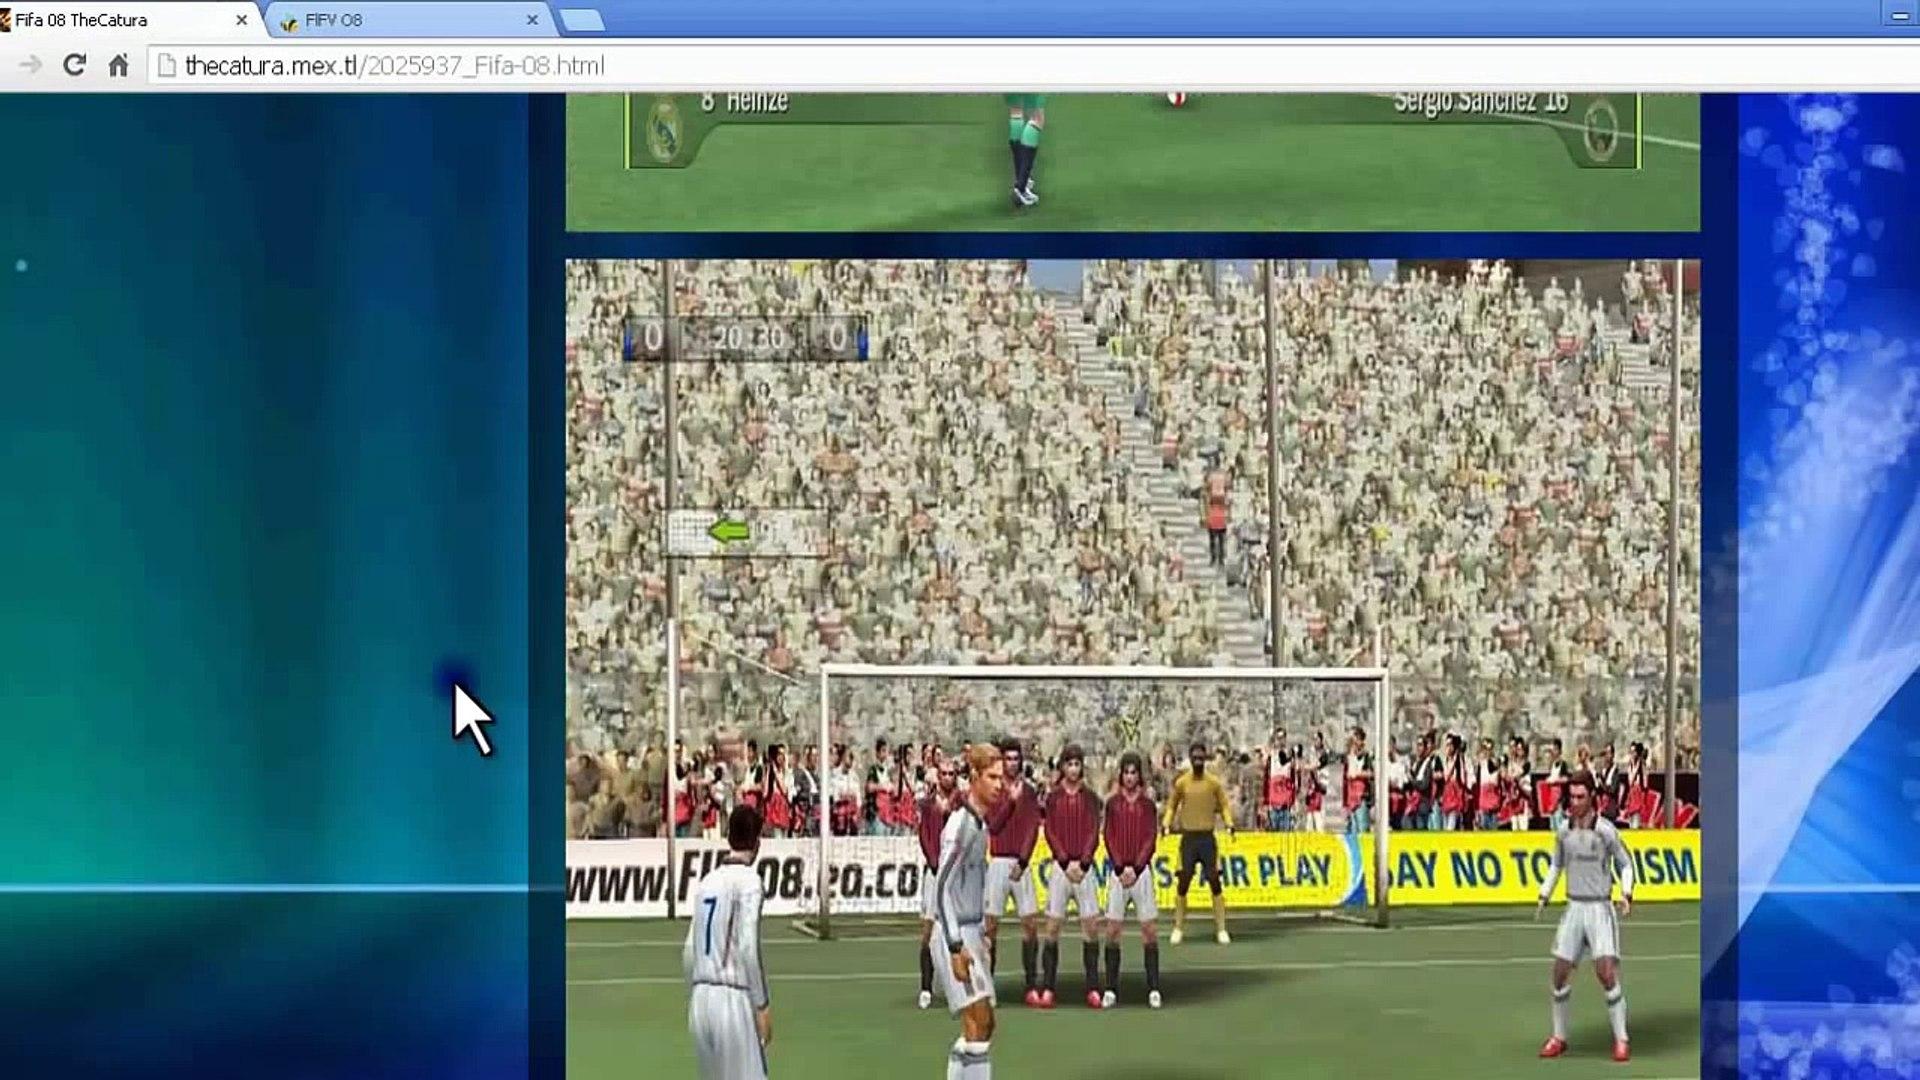 Como Descargar Fifa 08 Para Pc Mediafire En Español 1 Link видео Dailymotion